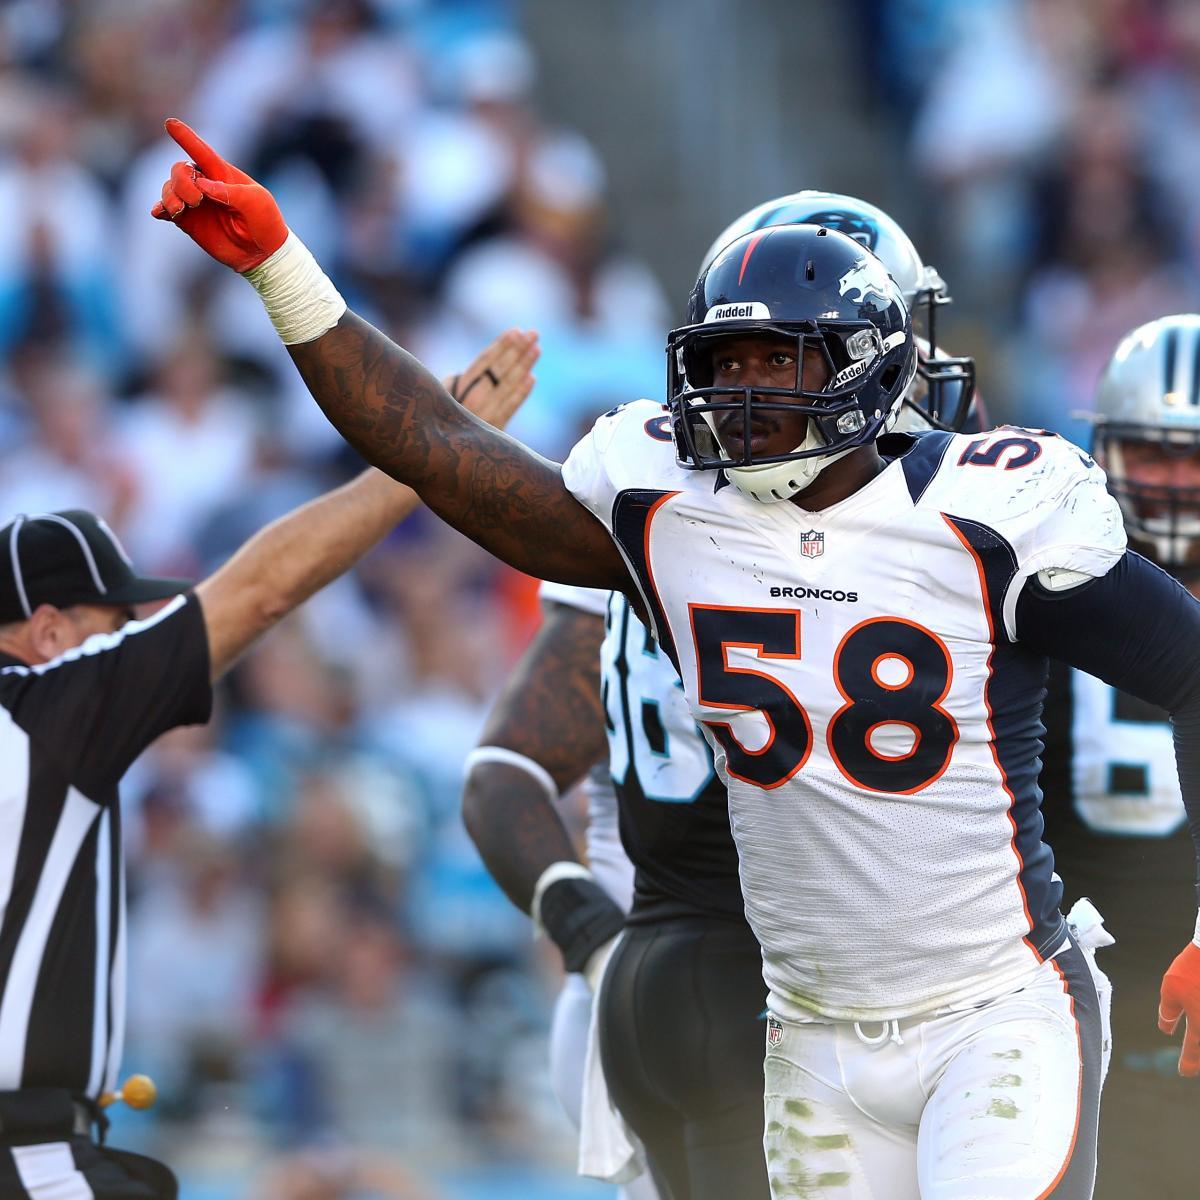 2012 Denver Broncos Are Better Than The 1998 Super Bowl